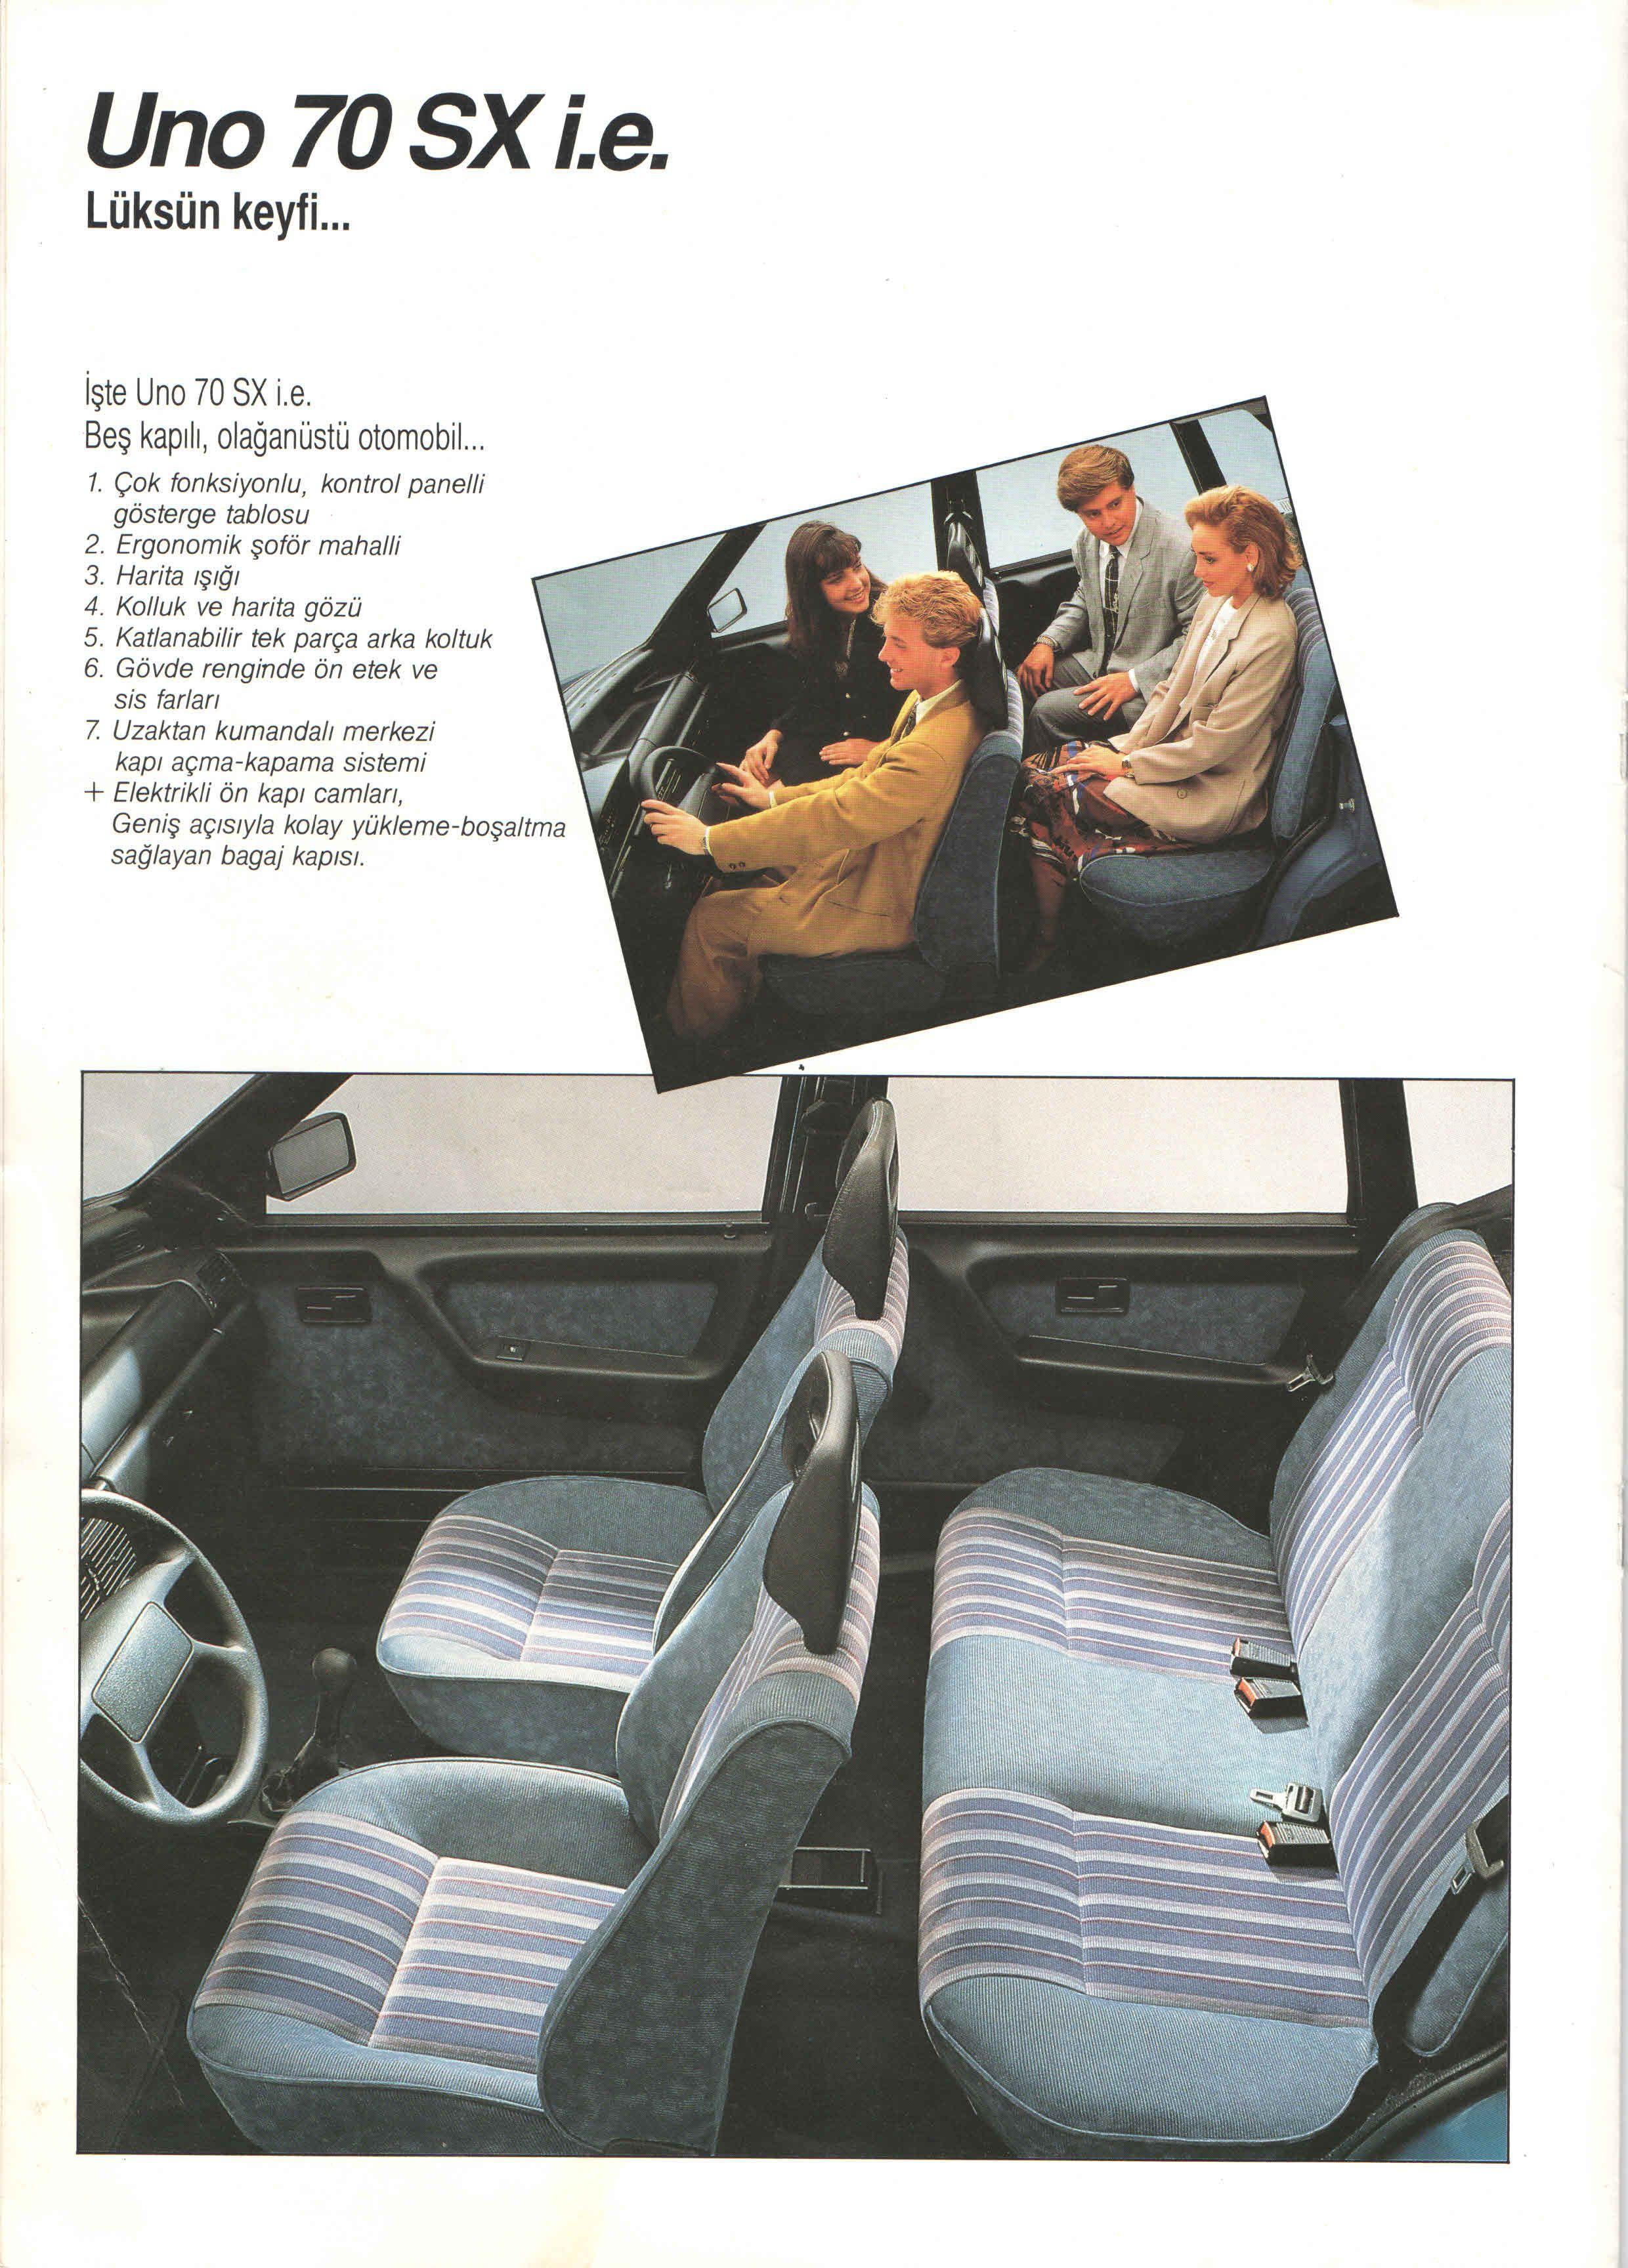 1993 Fiat Uno Turkish Catalog Page 4 8 1993 Fiat Uno Turkce Katalog Sayfa 4 8 Otomobil